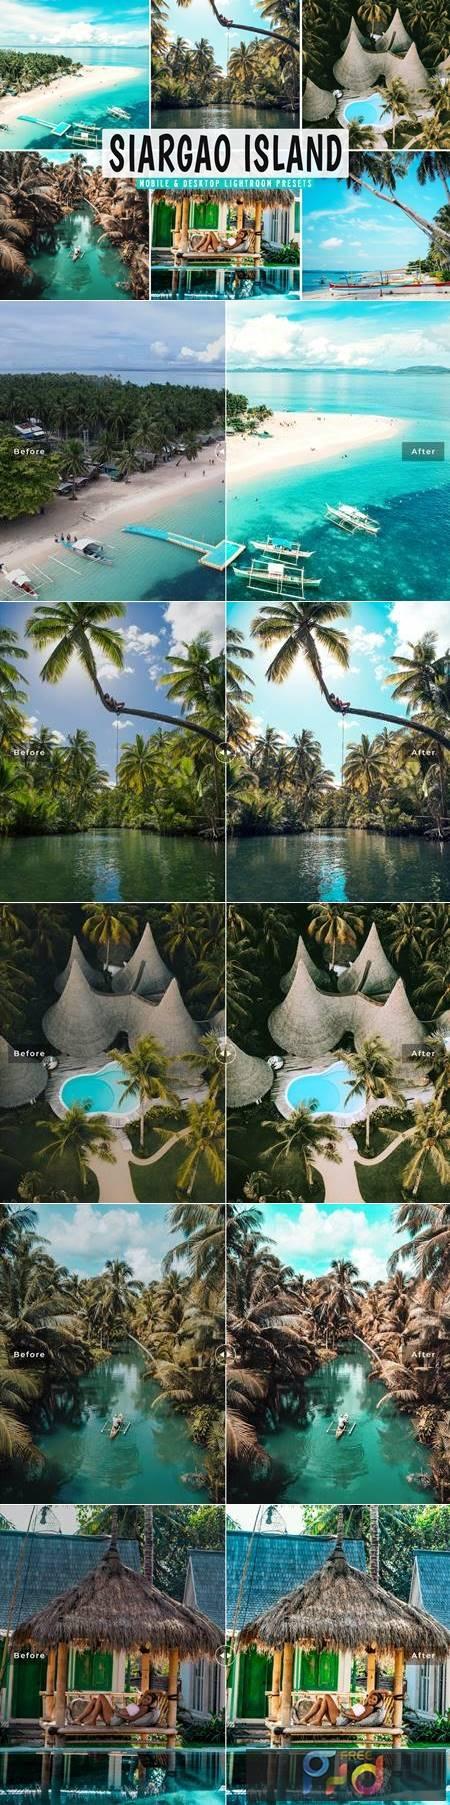 Siargao Island Mobile & Desktop Lightroom Presets 5ZQP6DD 1